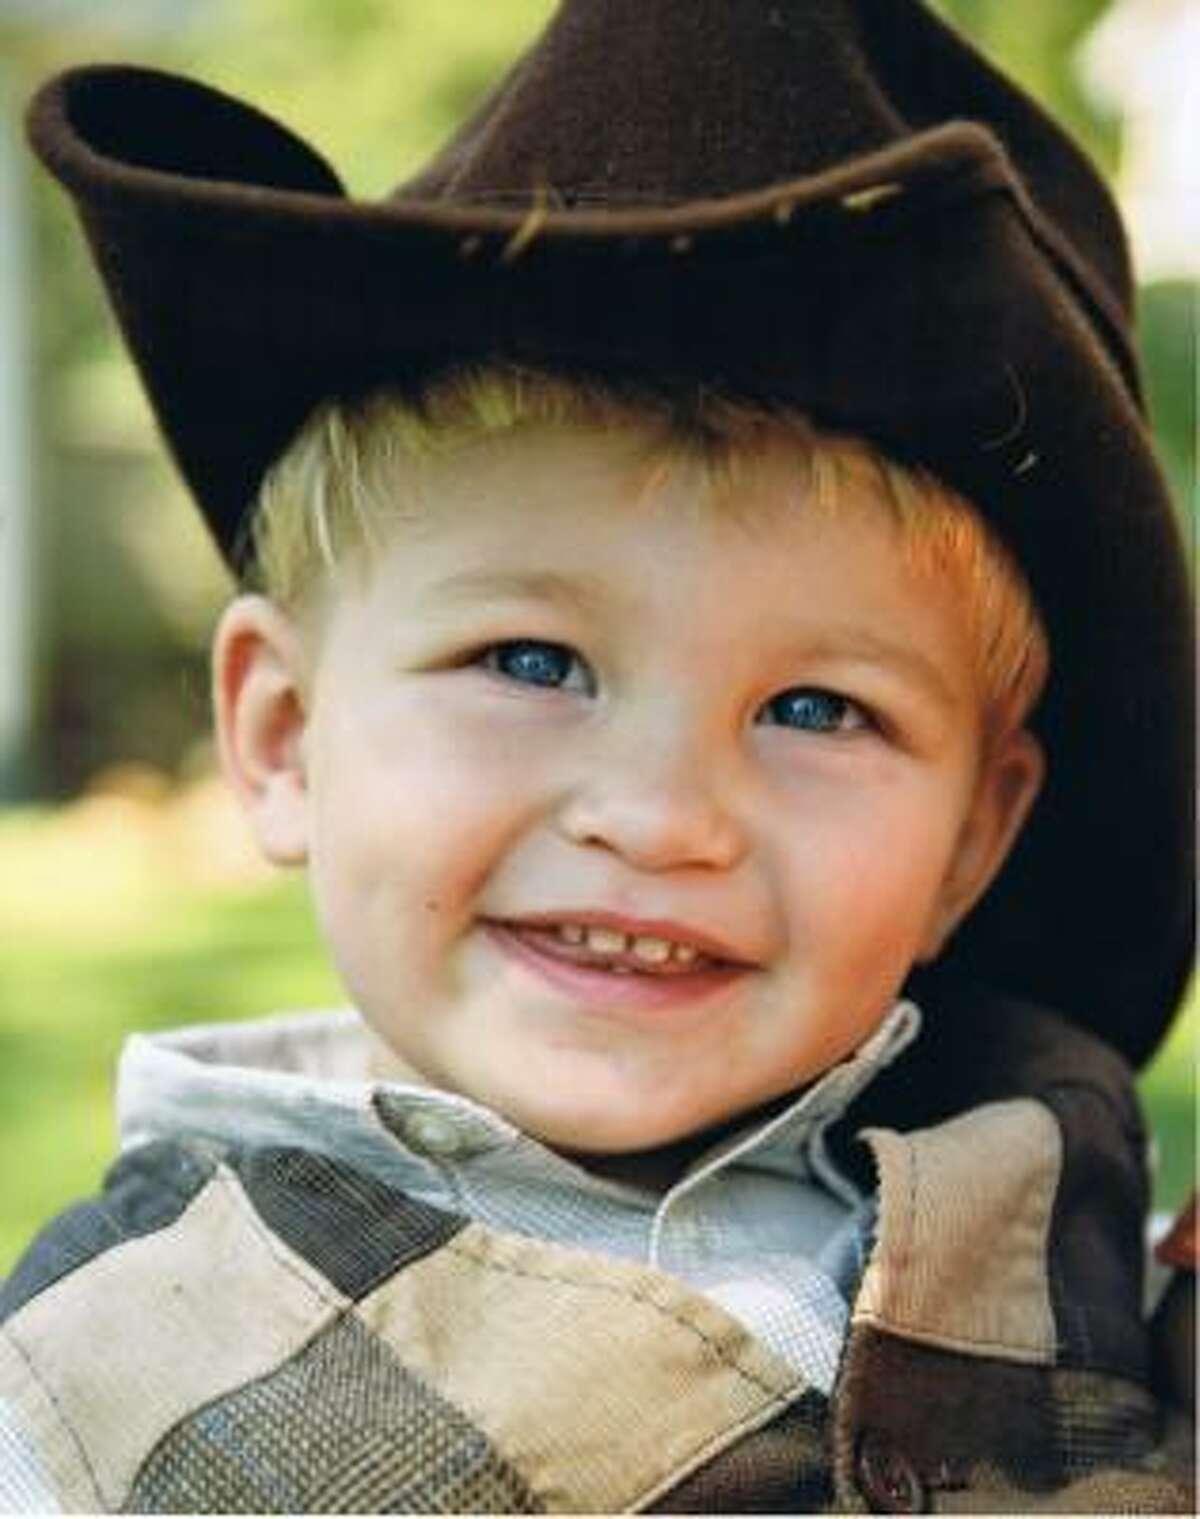 CowboyMatt